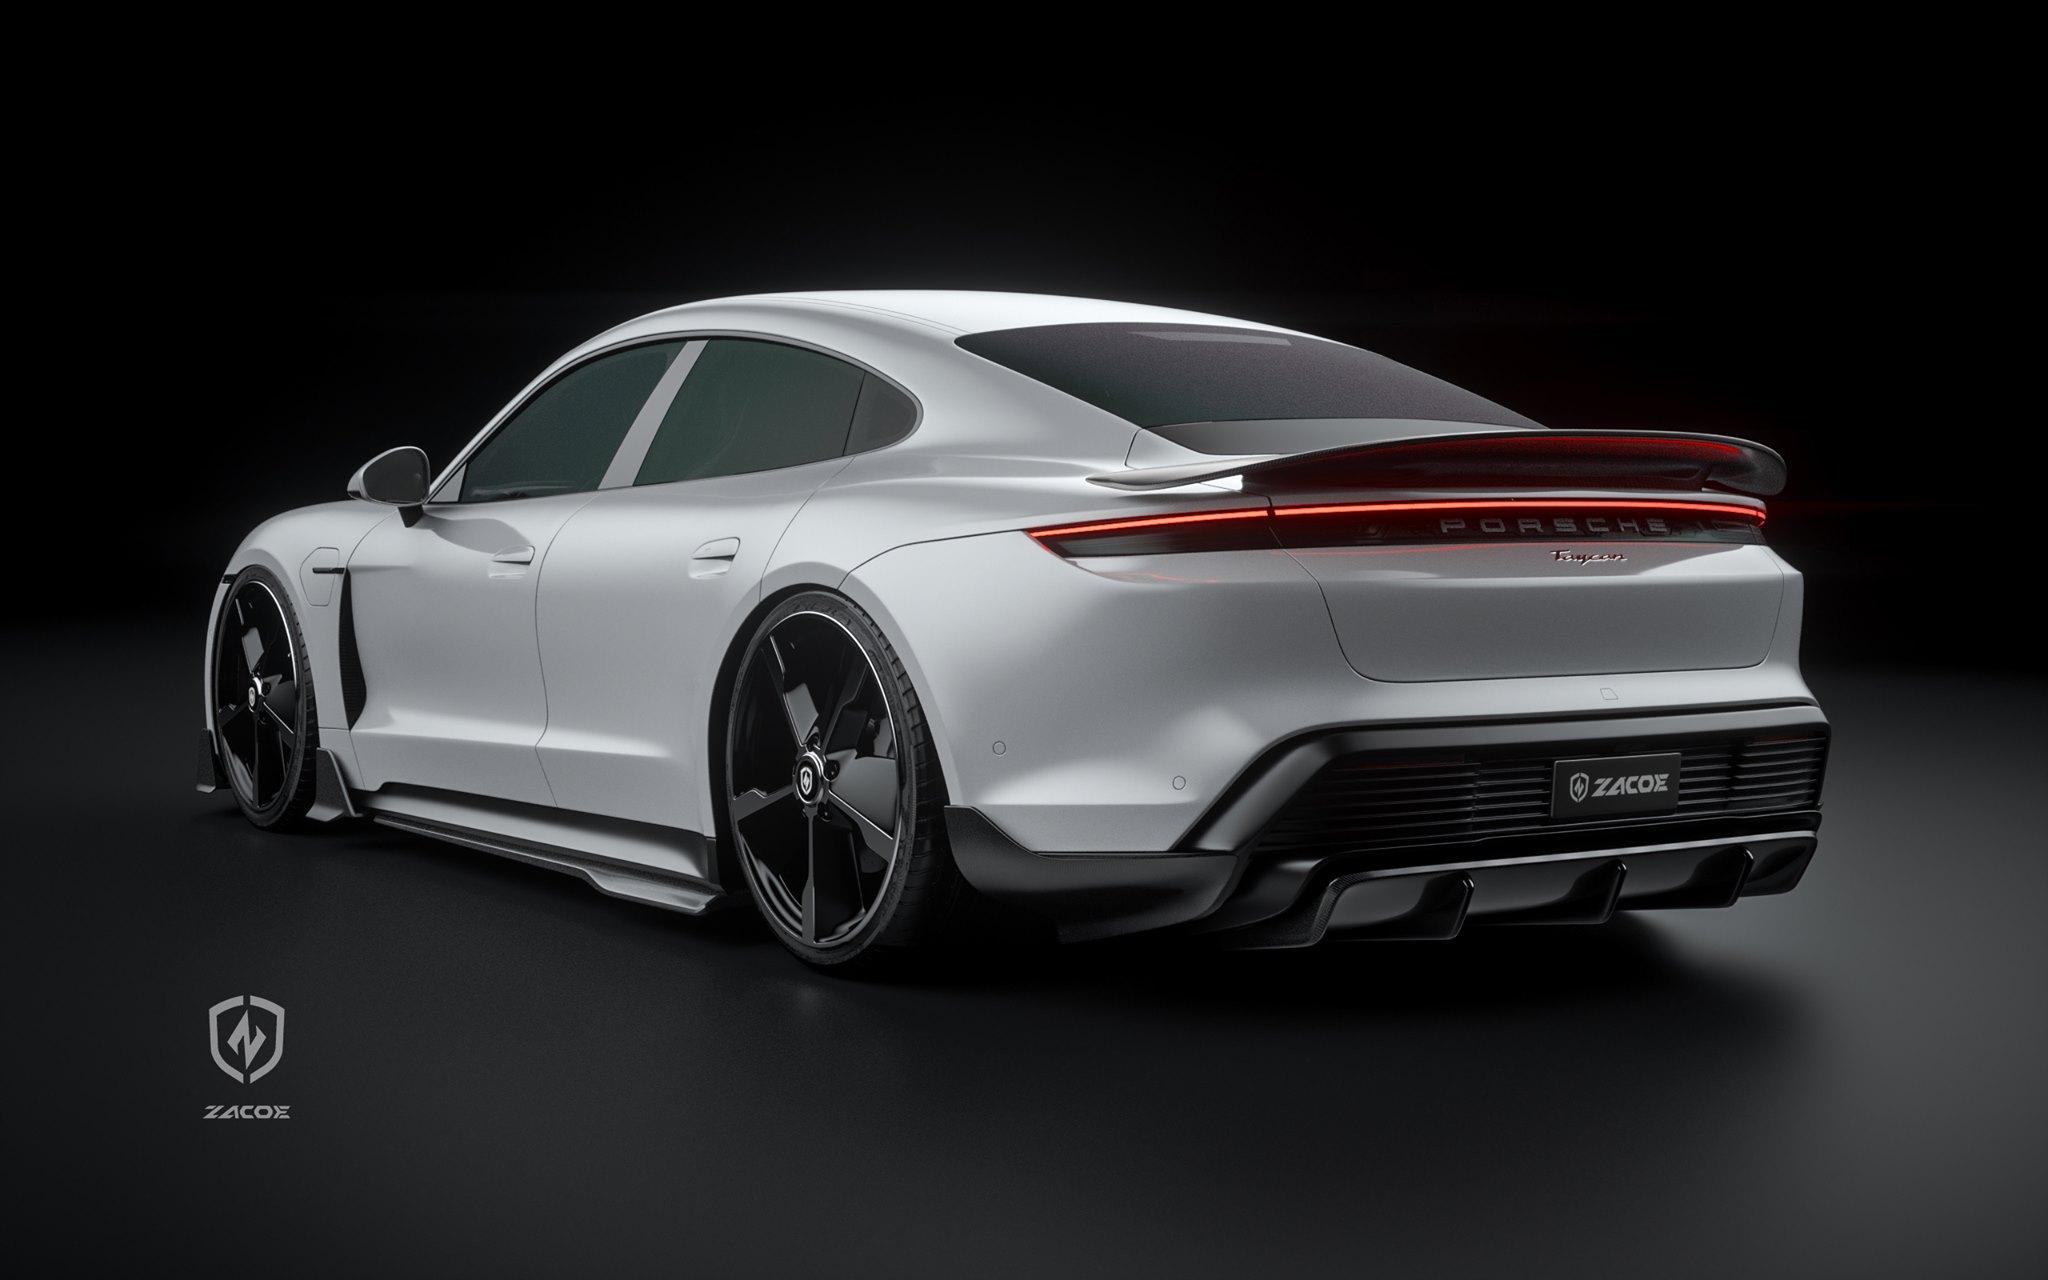 Porsche-Taycan-by-Zacoe-4